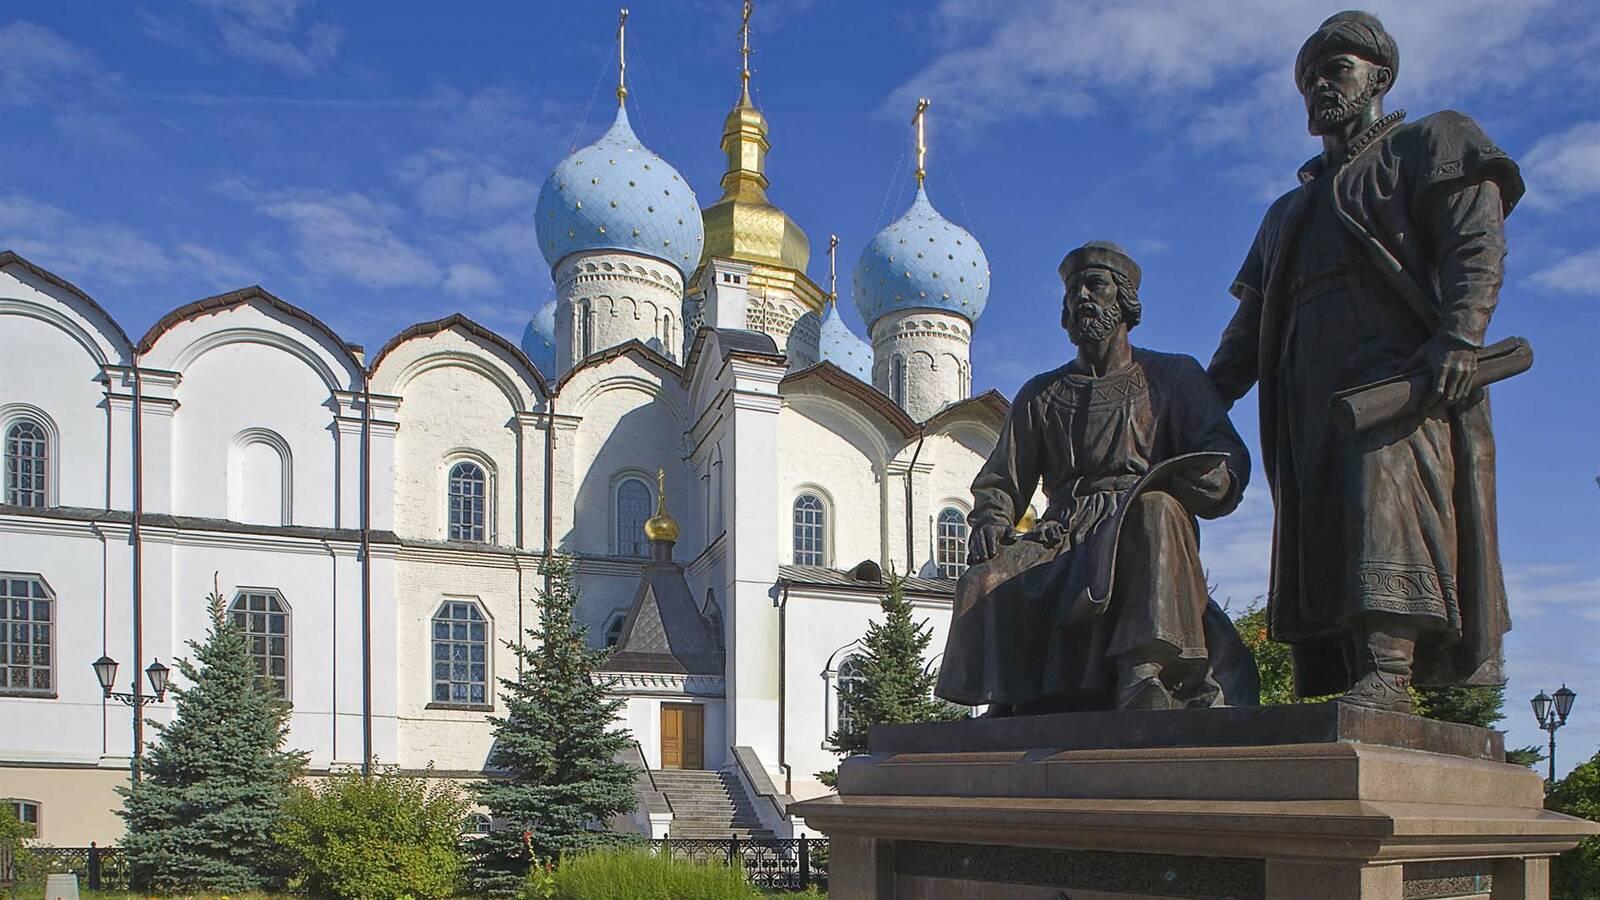 Transsiberien Golden Eagle Train KazanCathedral